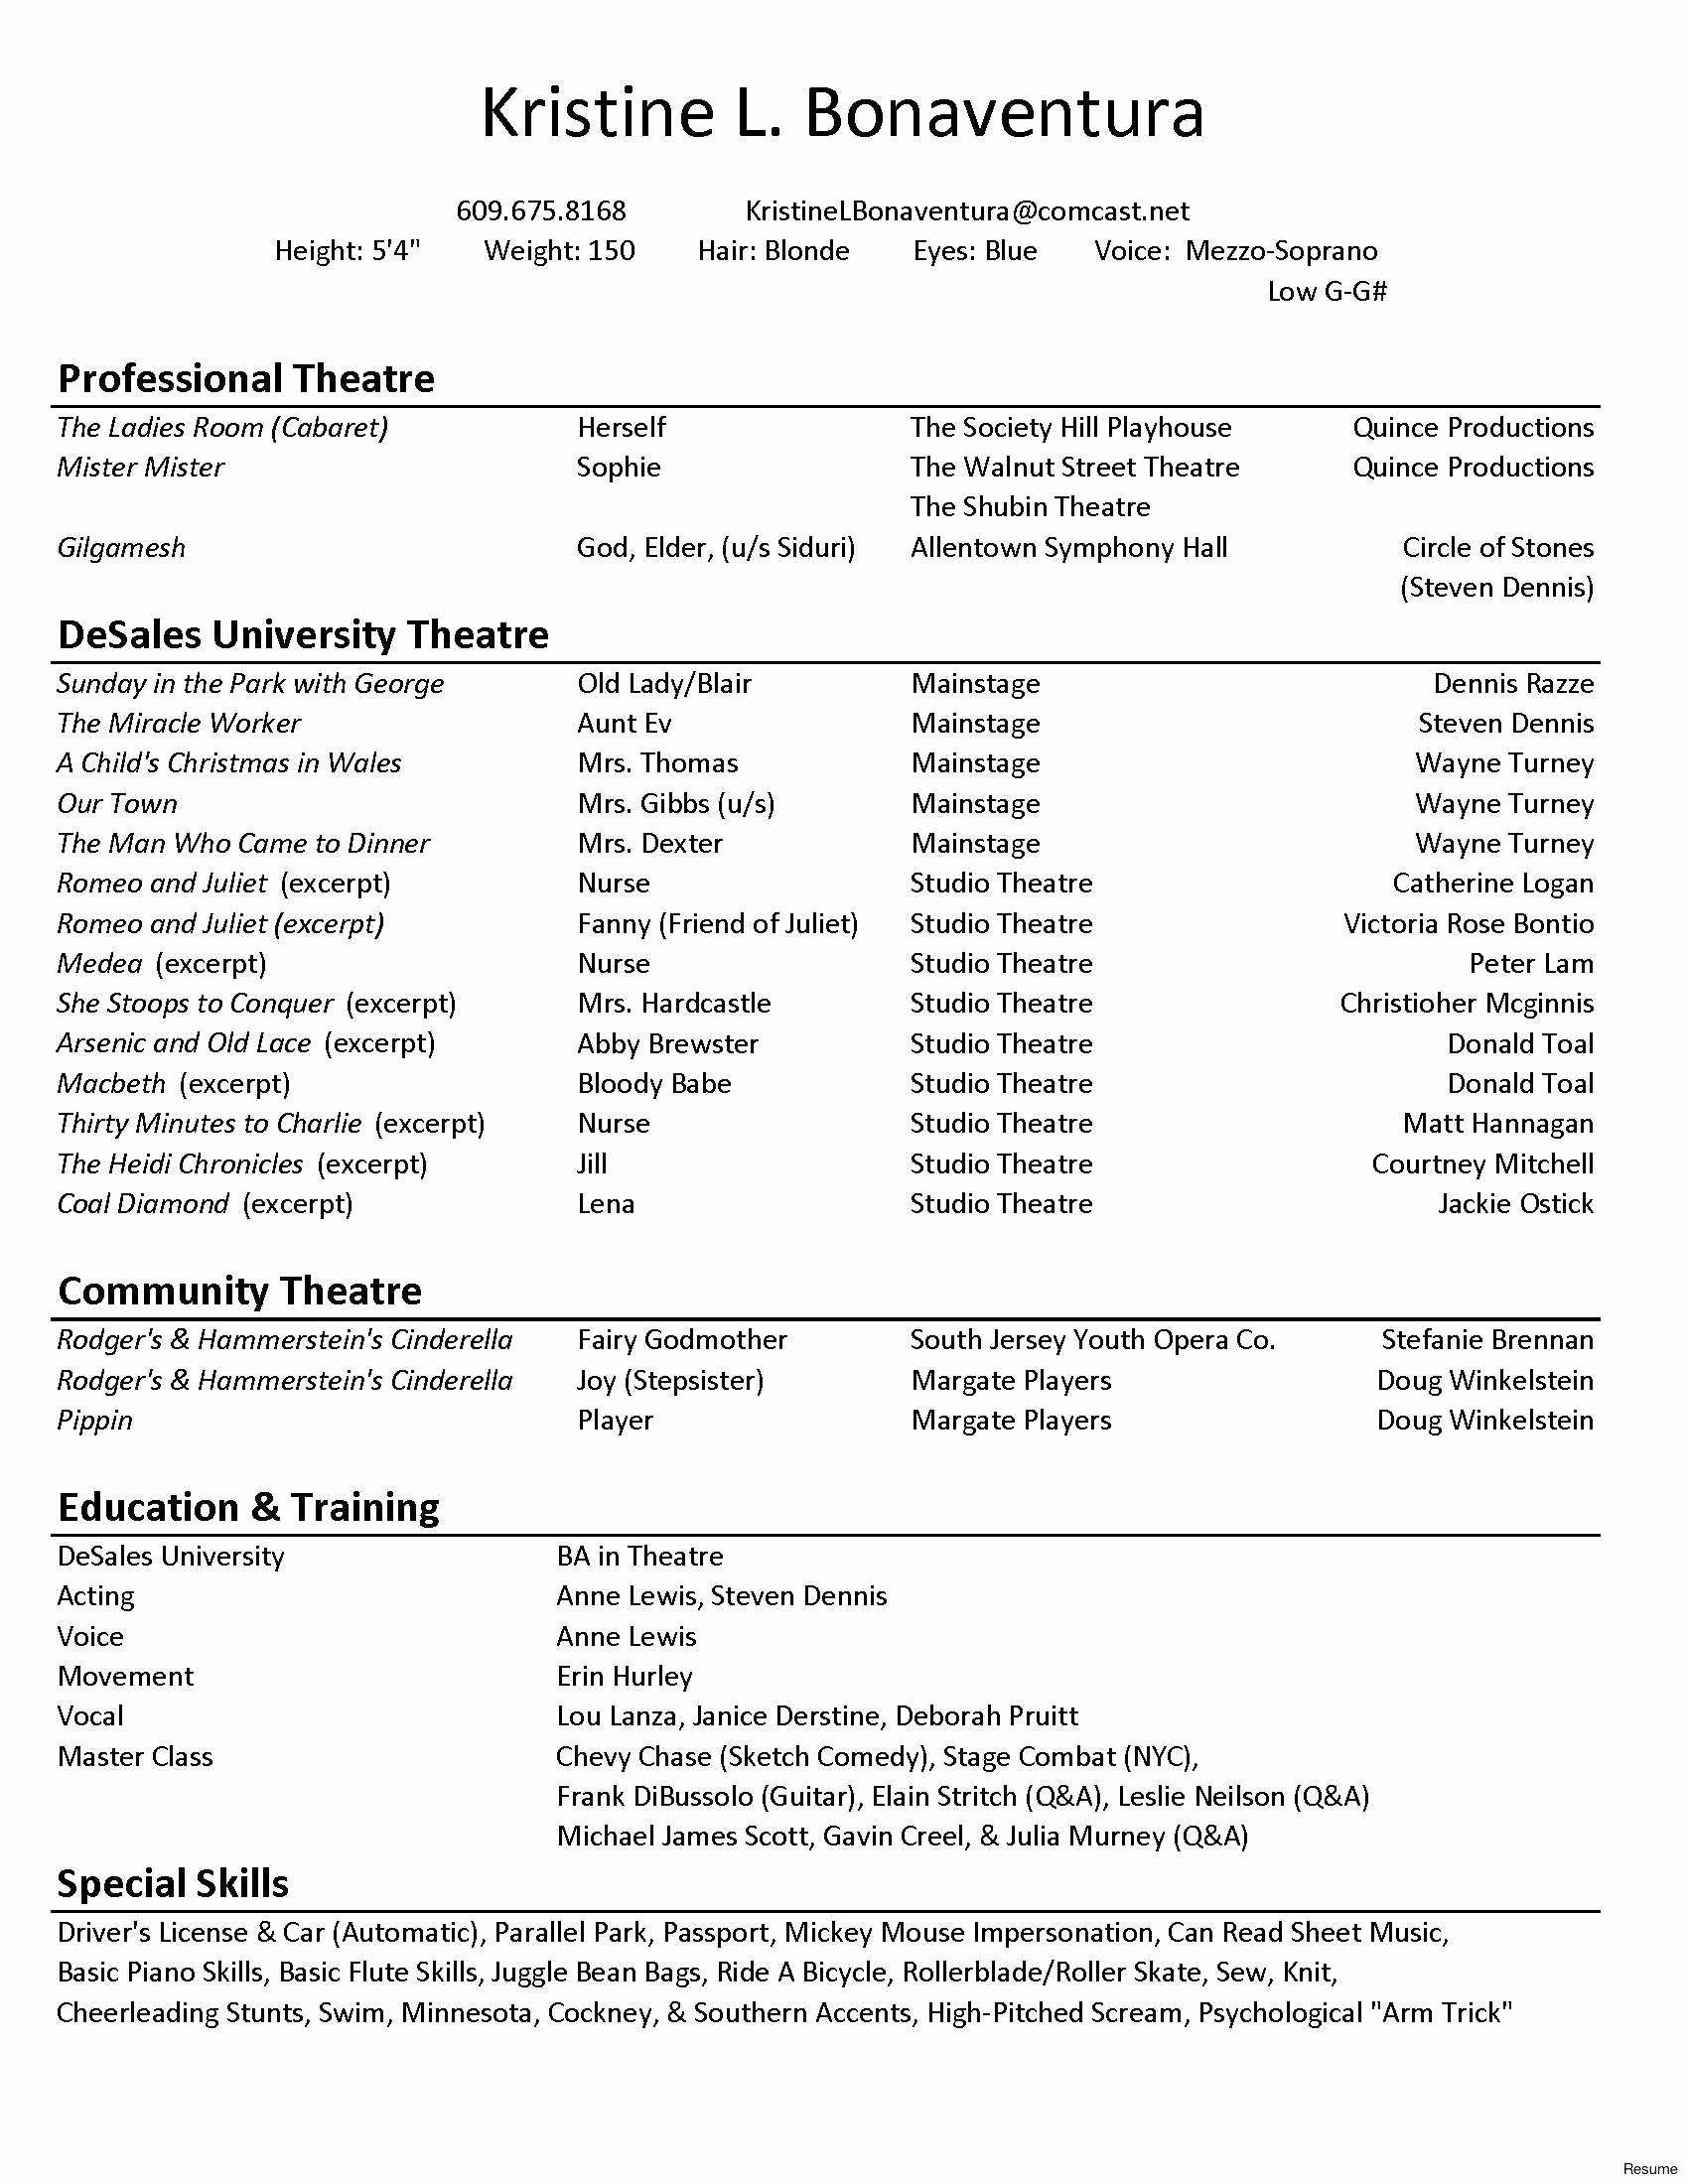 005 Sensational Technical Theatre Resume Template Concept  Google Doc TechFull